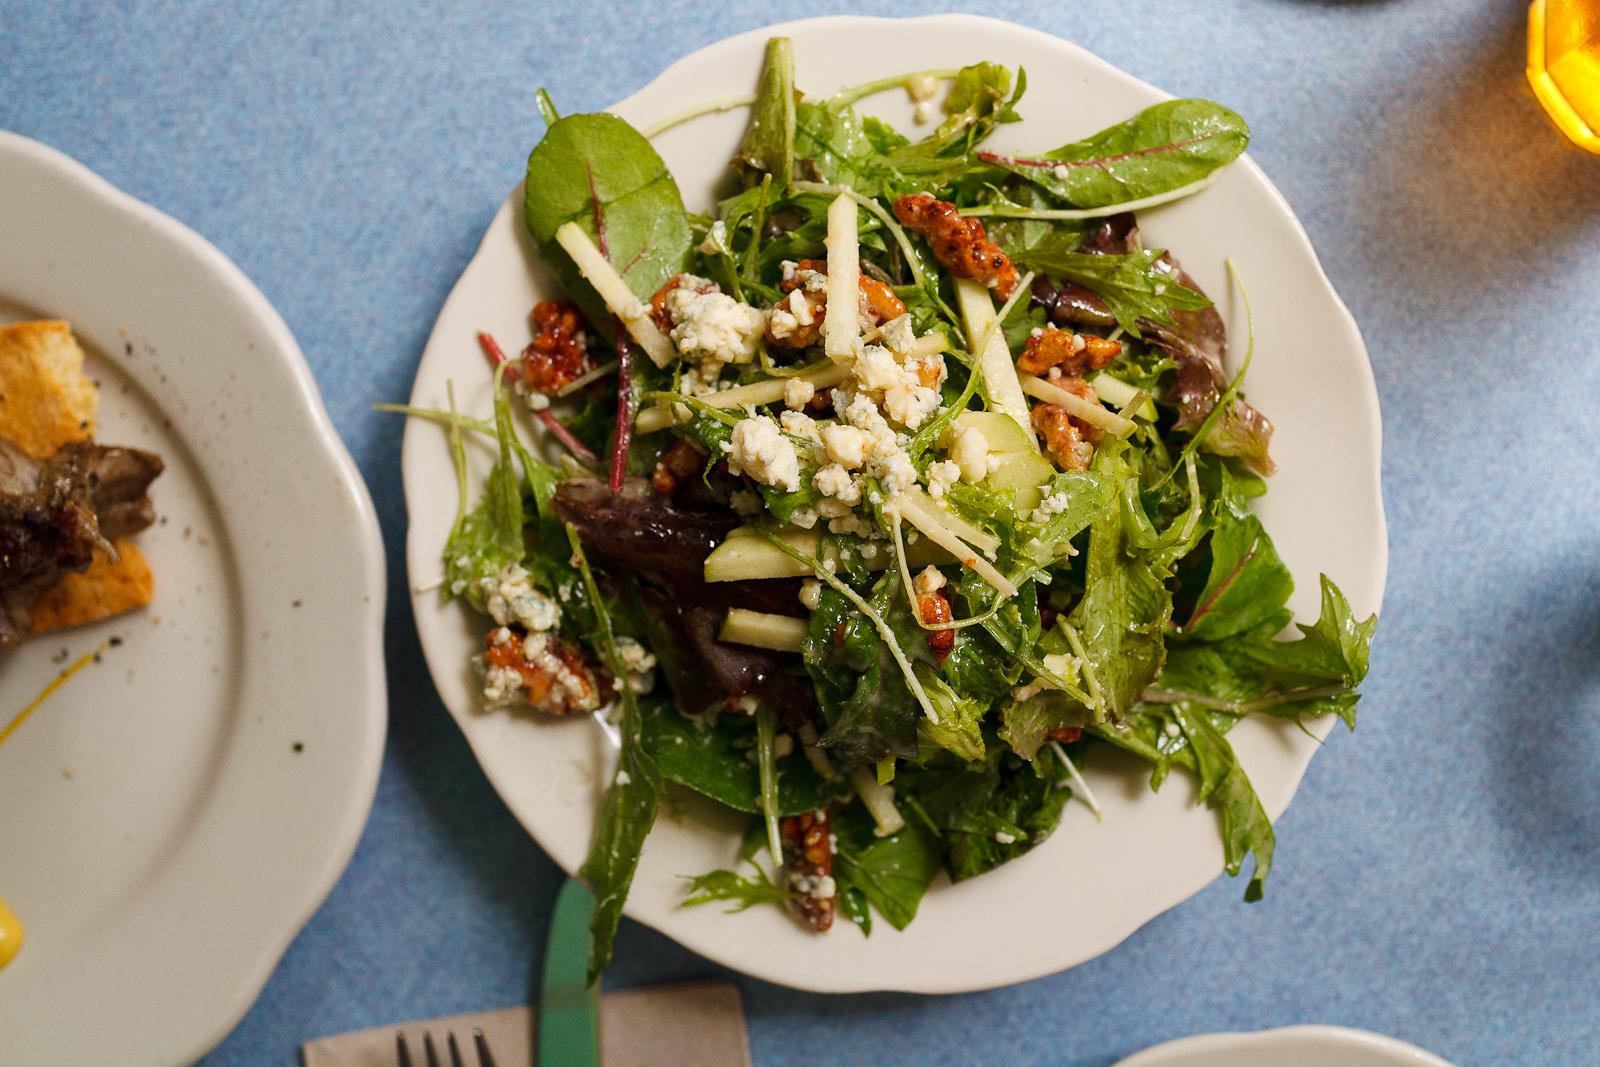 Blue Cheese Salad, Beauty Greens, Apples, Walnuts ($9)